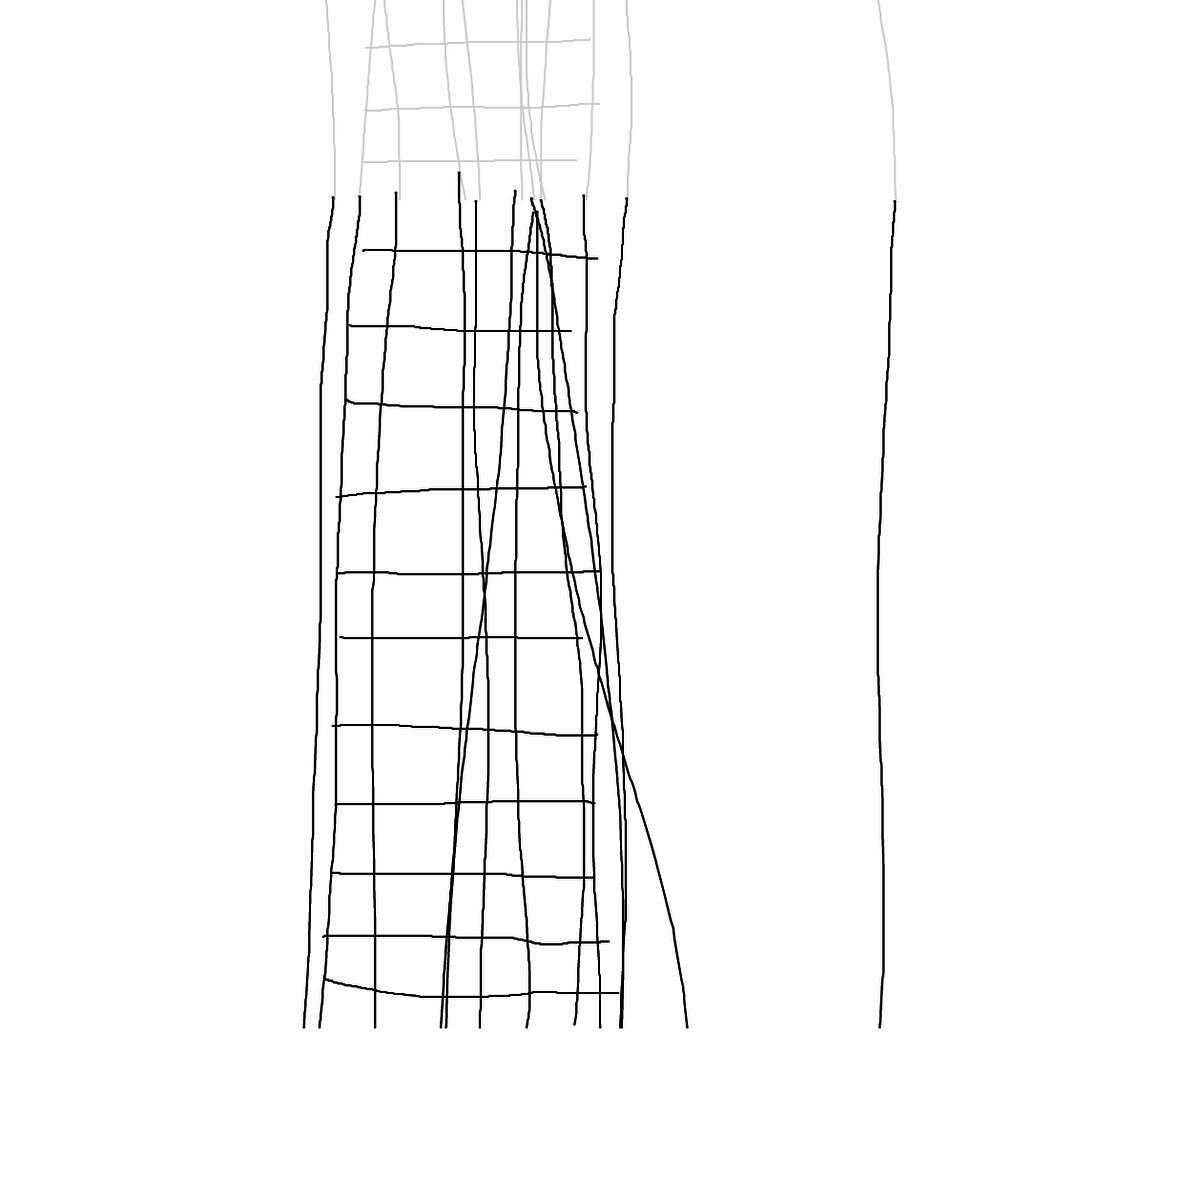 BAAAM drawing#19217 lat:60.3901100158691400lng: 25.6670341491699220